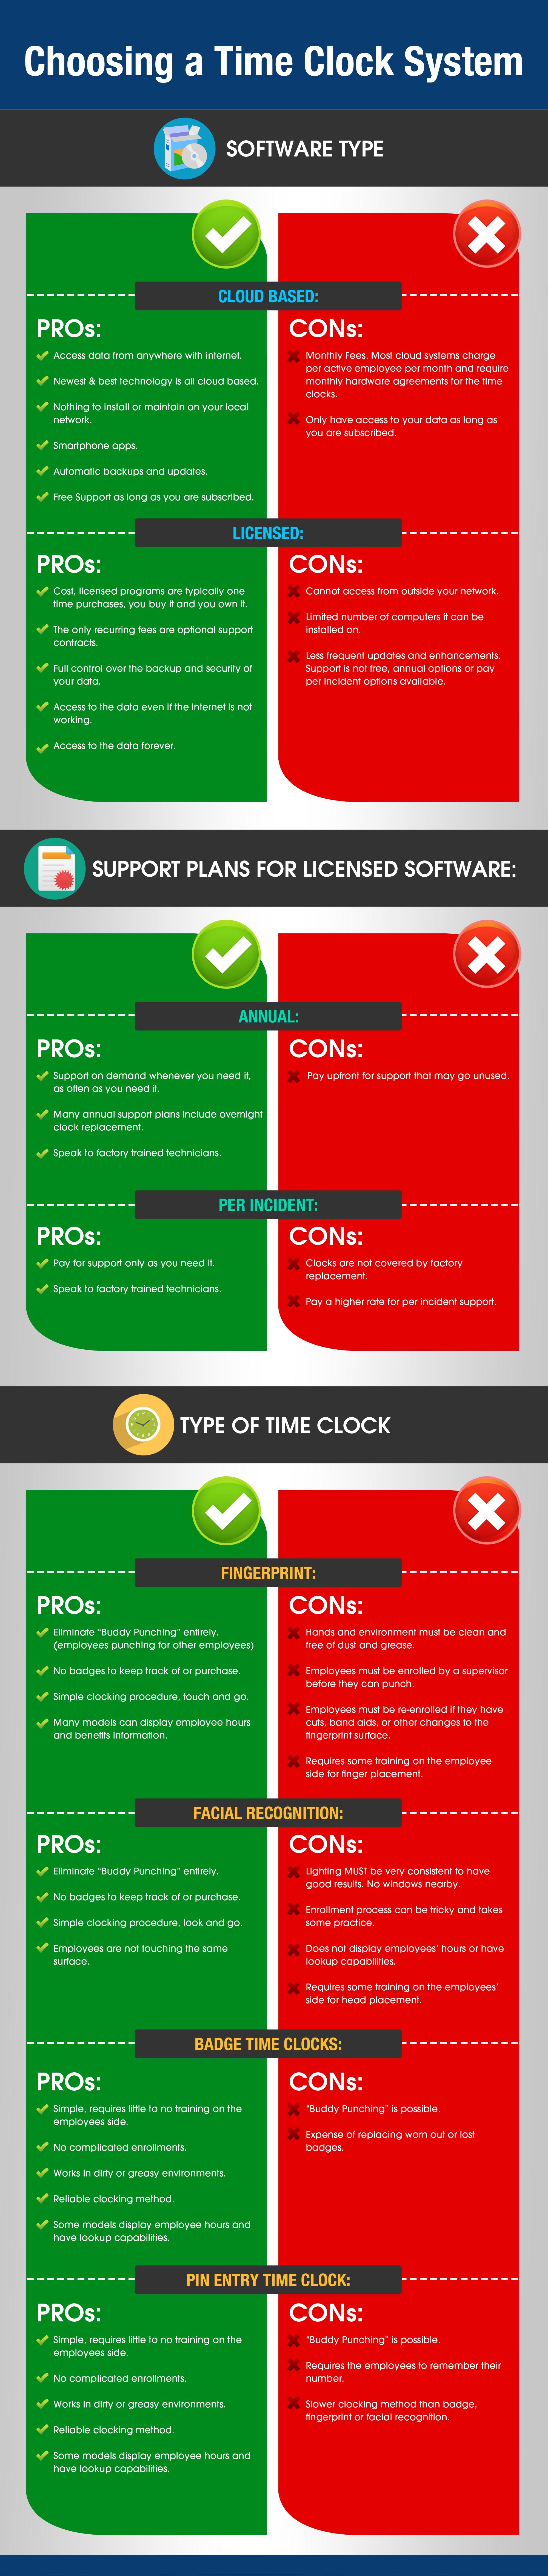 choosing-a-time-clock-system.jpg